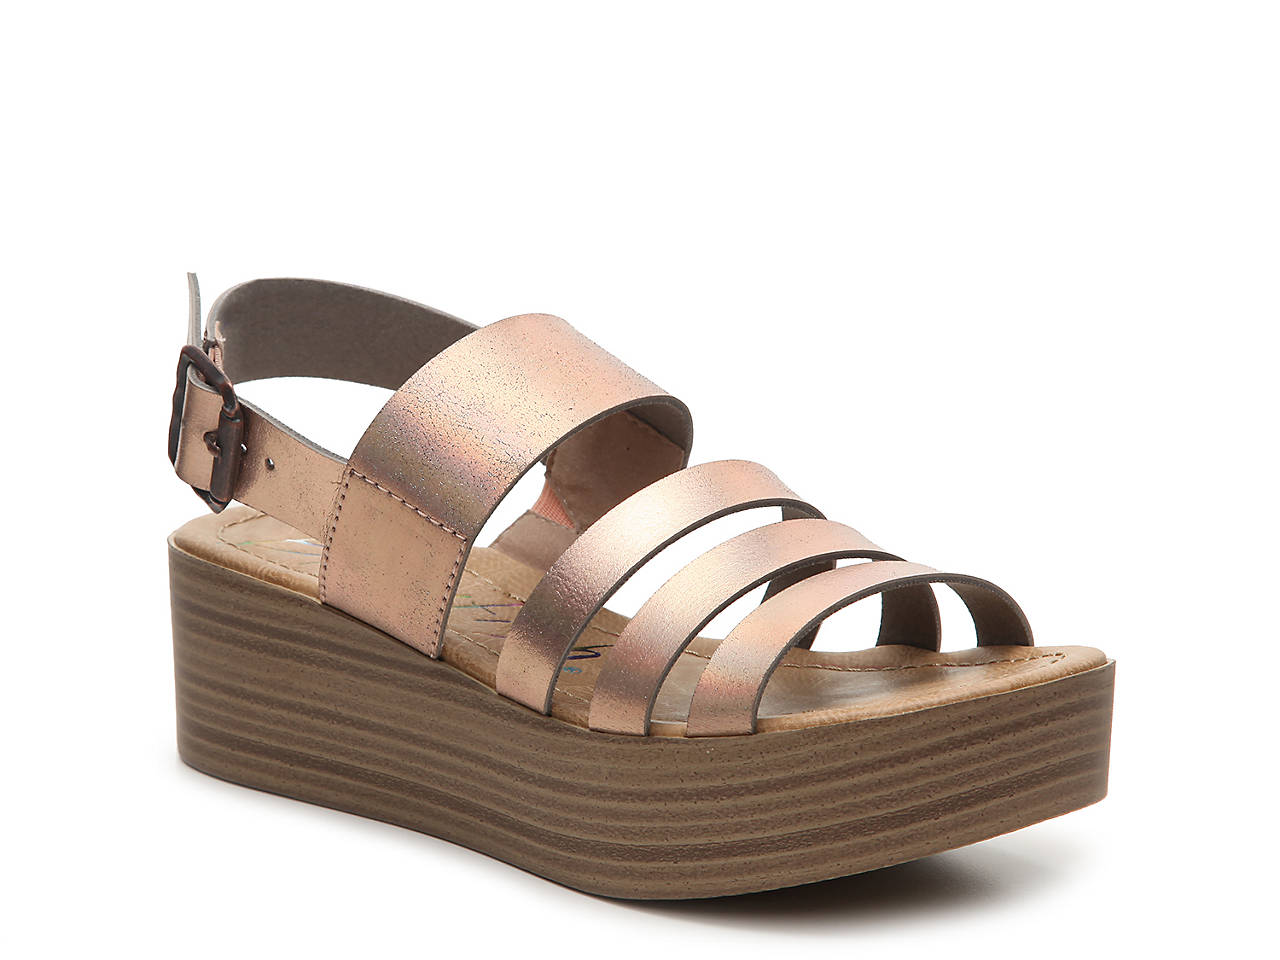 b4abf97400d Blowfish Lemmy Wedge Sandal Women s Shoes